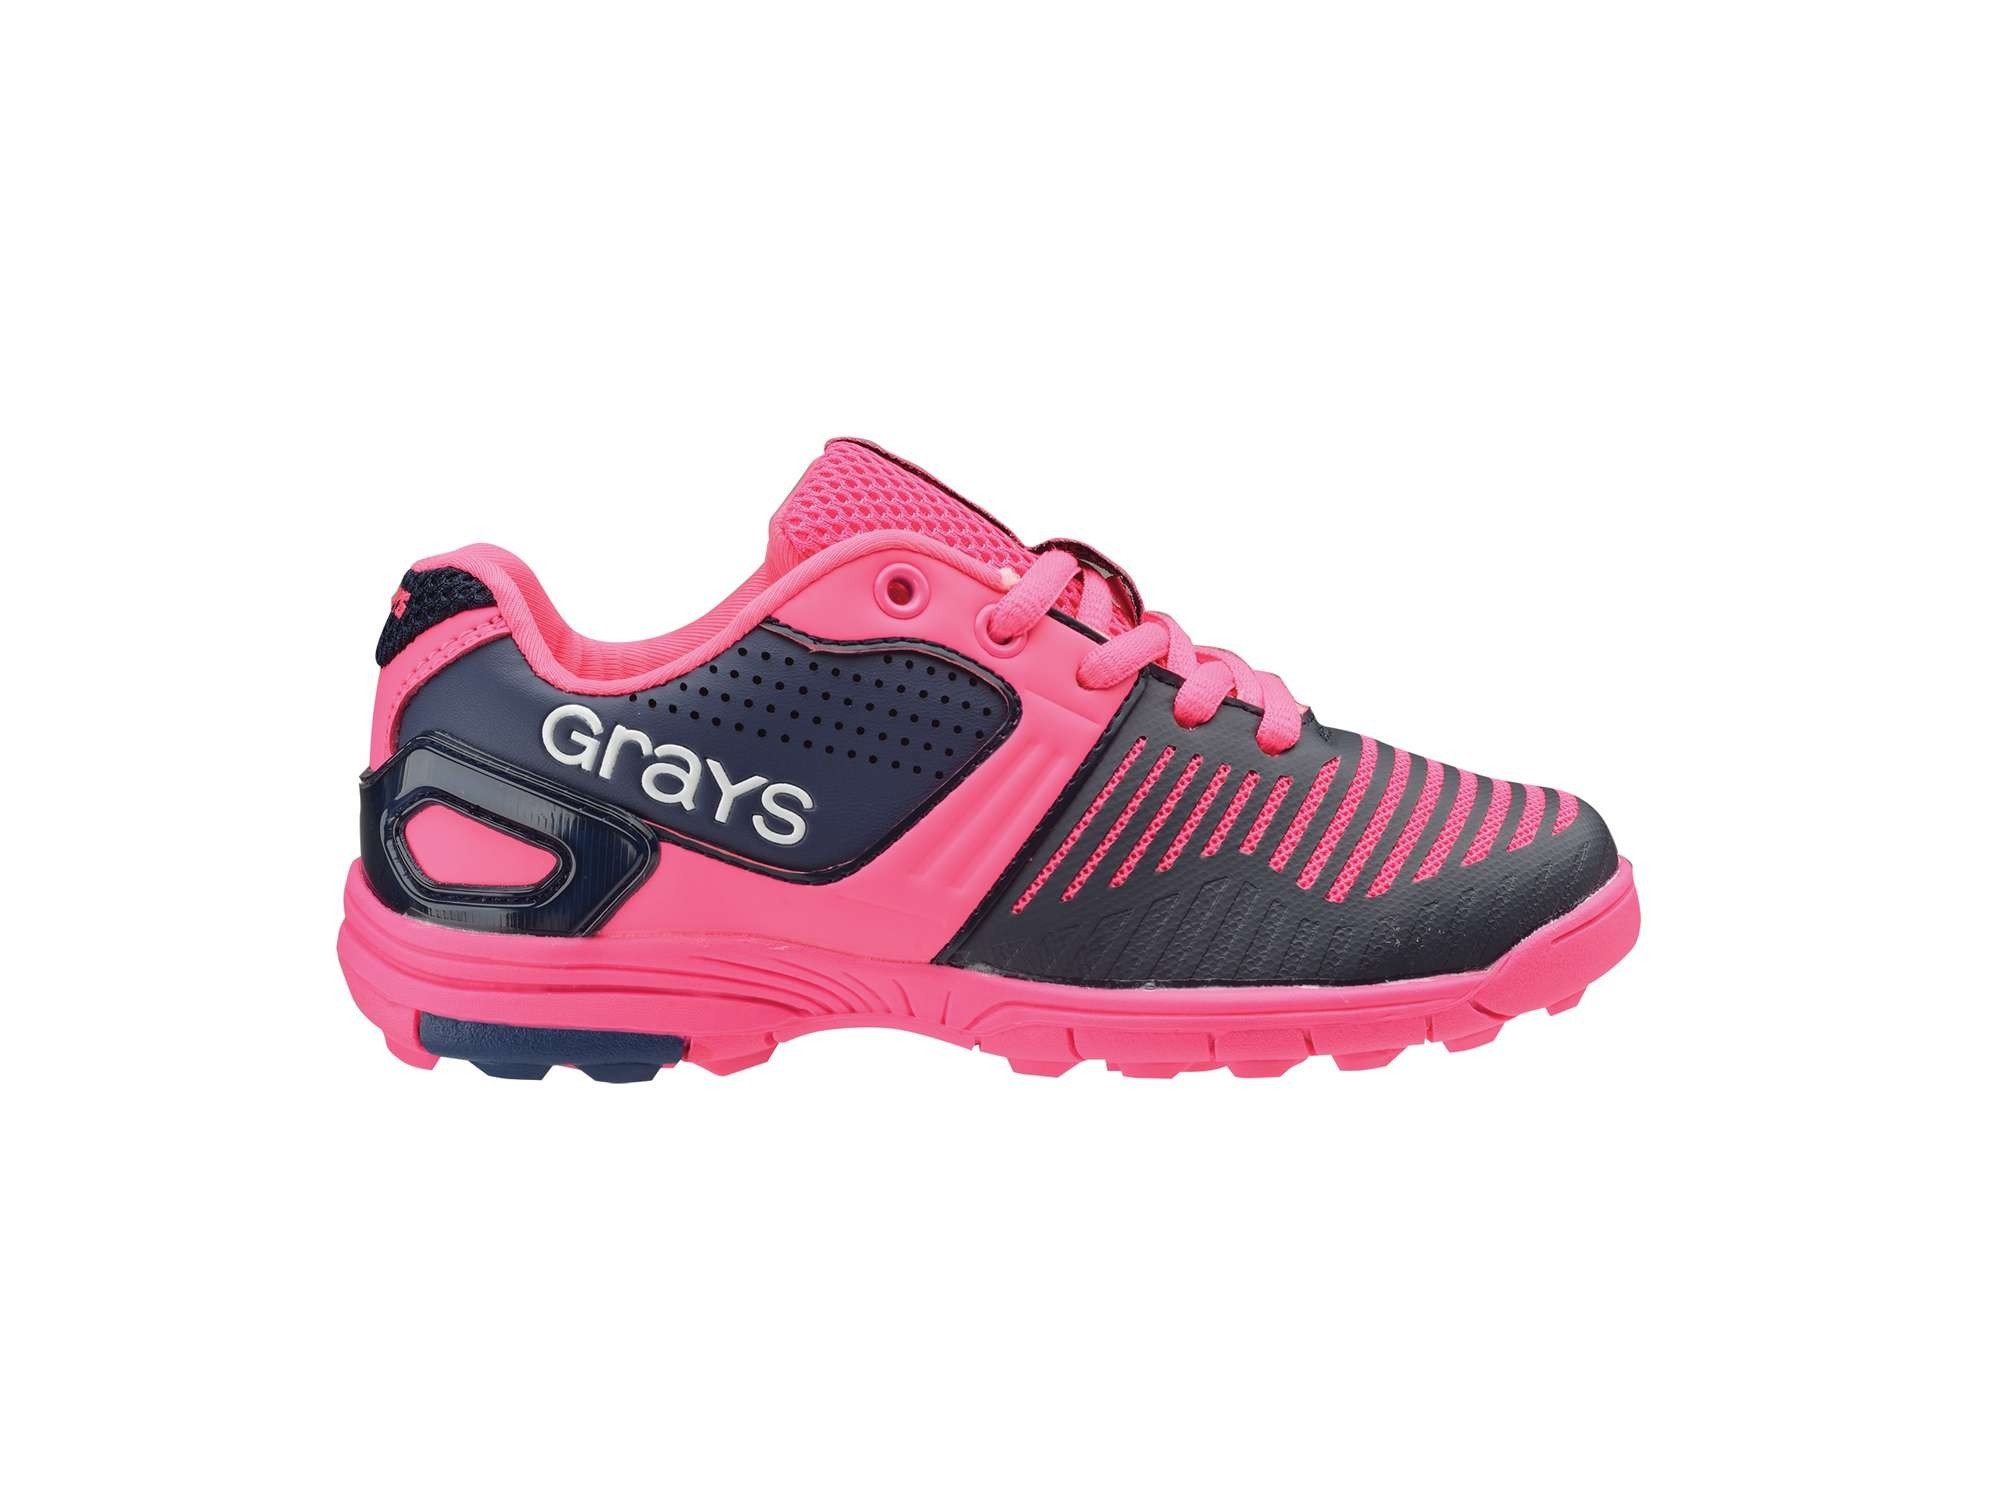 Grays GX 550 Junior Hockey Shoes